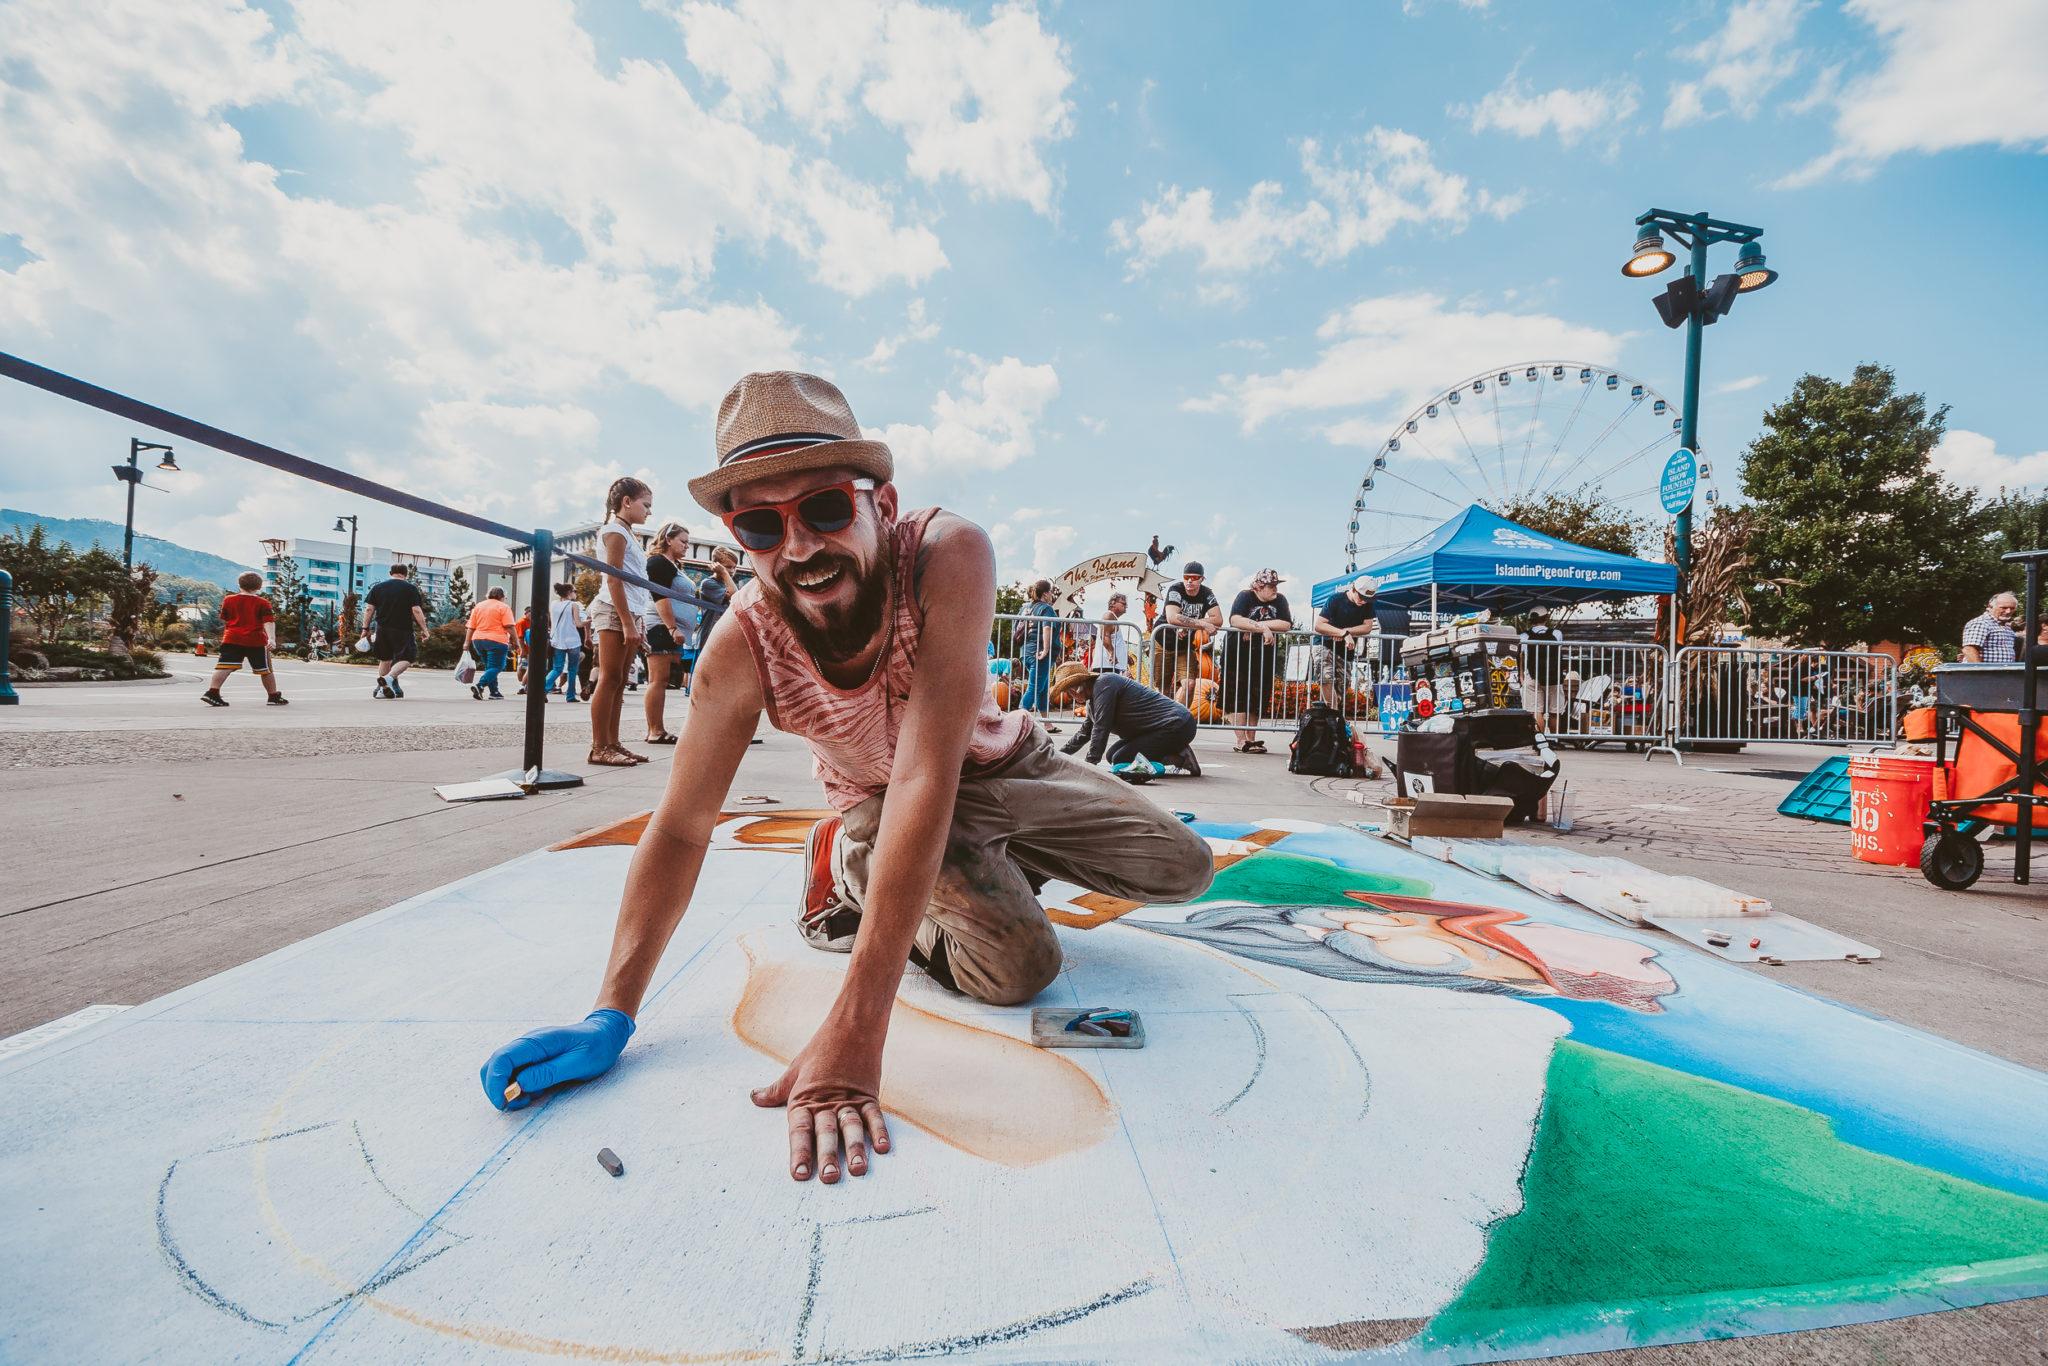 Chalk artist on ground smiling at camera